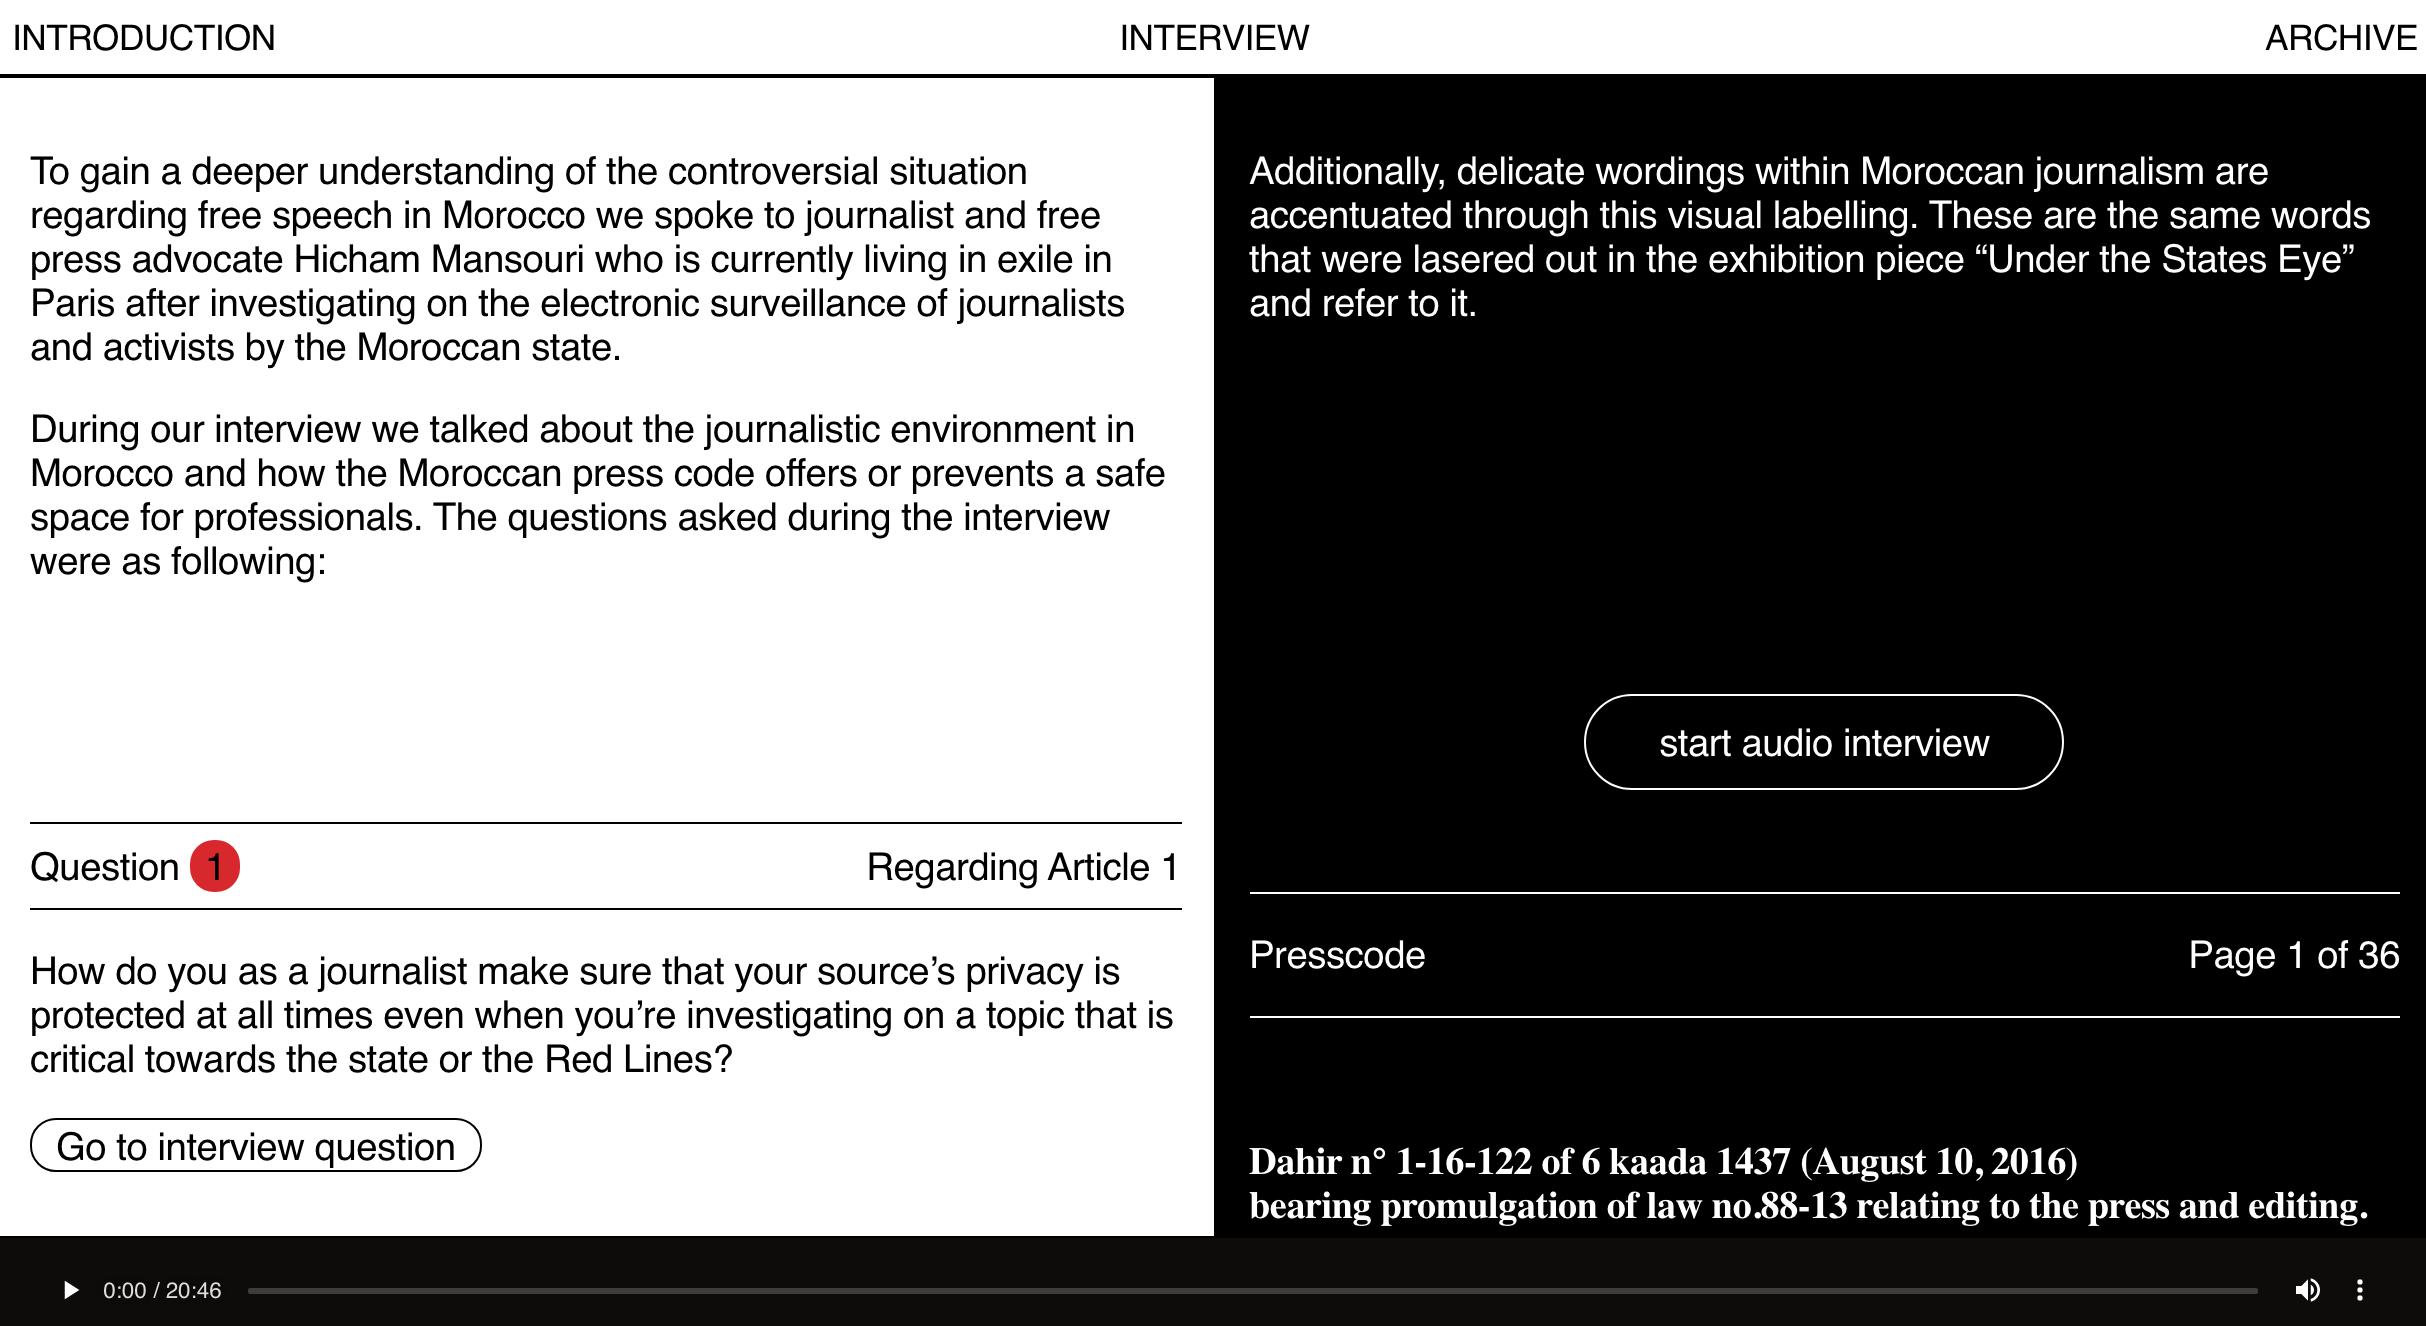 screenshot http://morocco.rectangle.design/introduction/